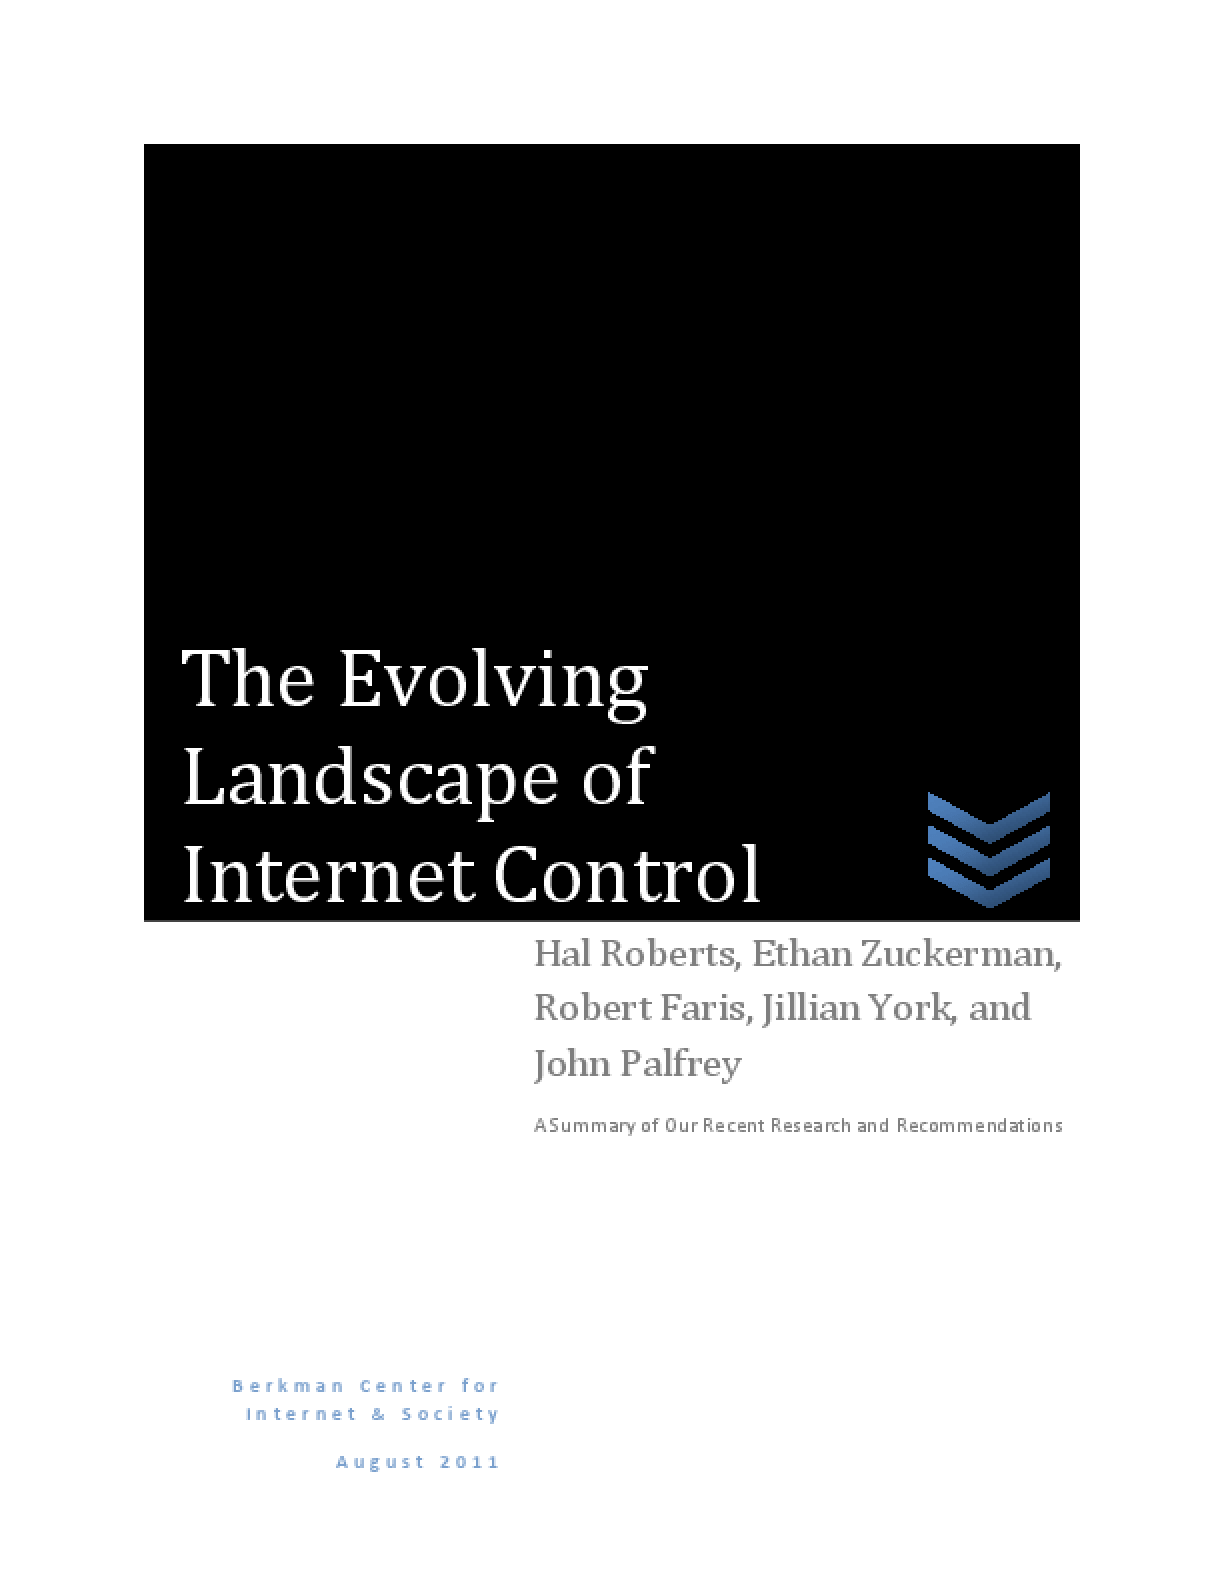 The Evolving Landscape of Internet Control